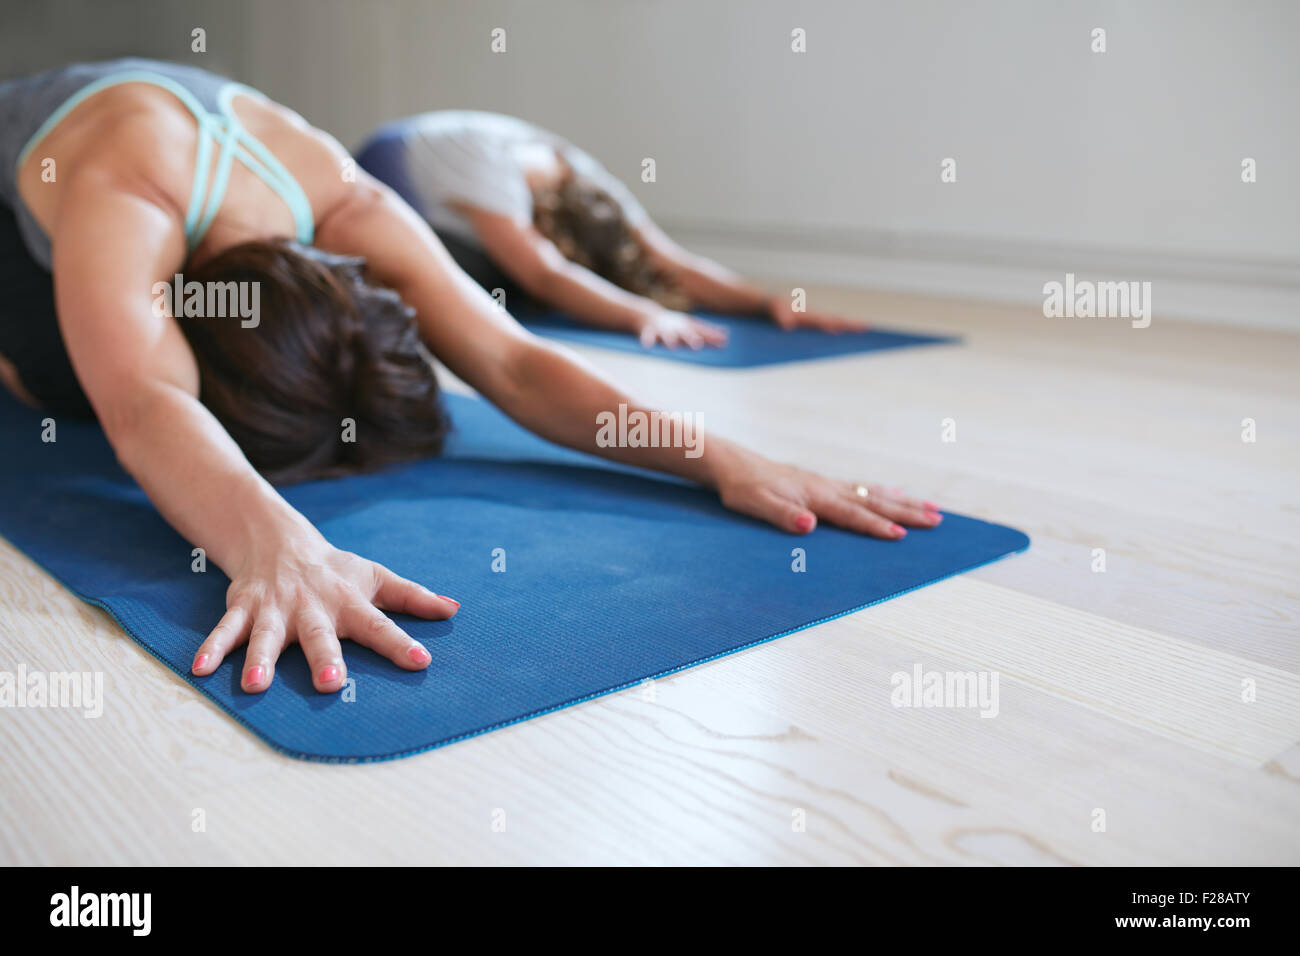 Two women doing stretching workout on fitness mat. Females performing yoga on exercise mat at gym. Child Pose, Balasana. - Stock Image